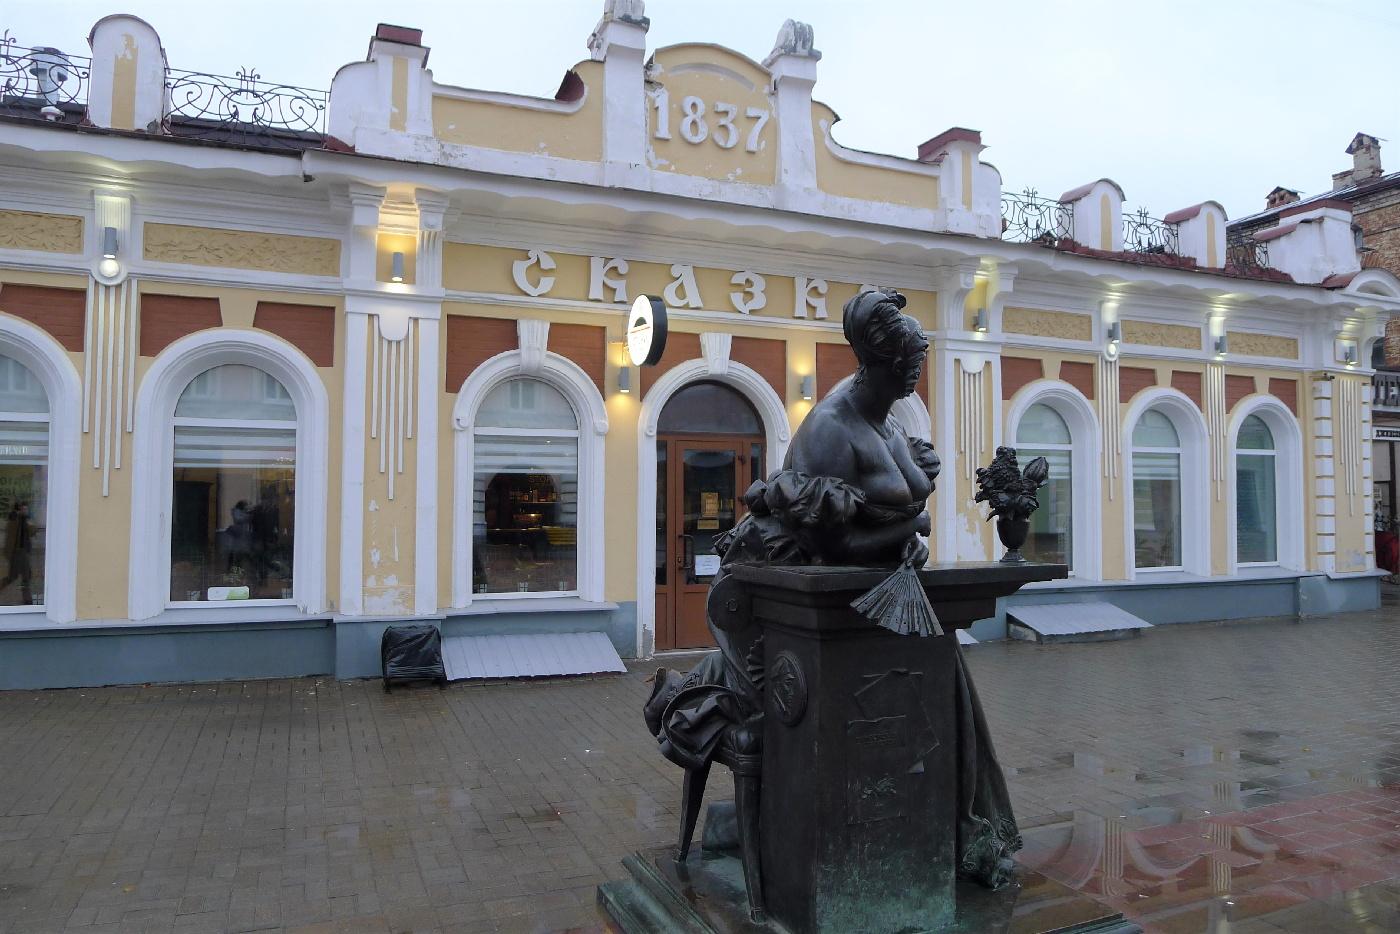 Русский Юг: Тамбов (Усадьба Асеевых, город) P1100370